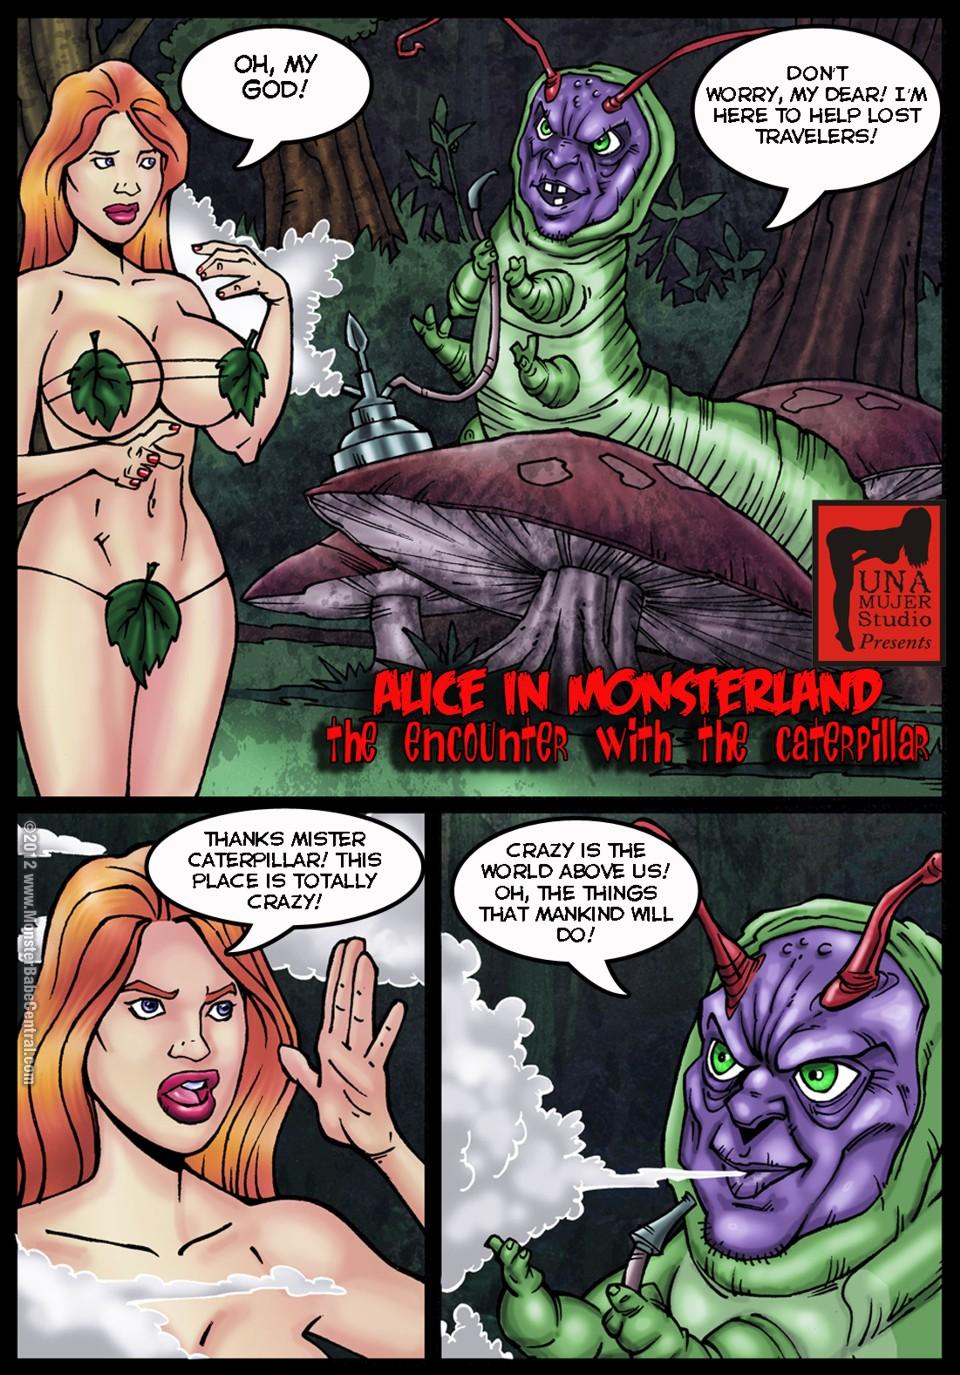 SureFap xxx porno Alice in Wonderland - [MonsterBabeCentral] - Alice in Monsterland 02 - The Encounter With The Ceterpillar